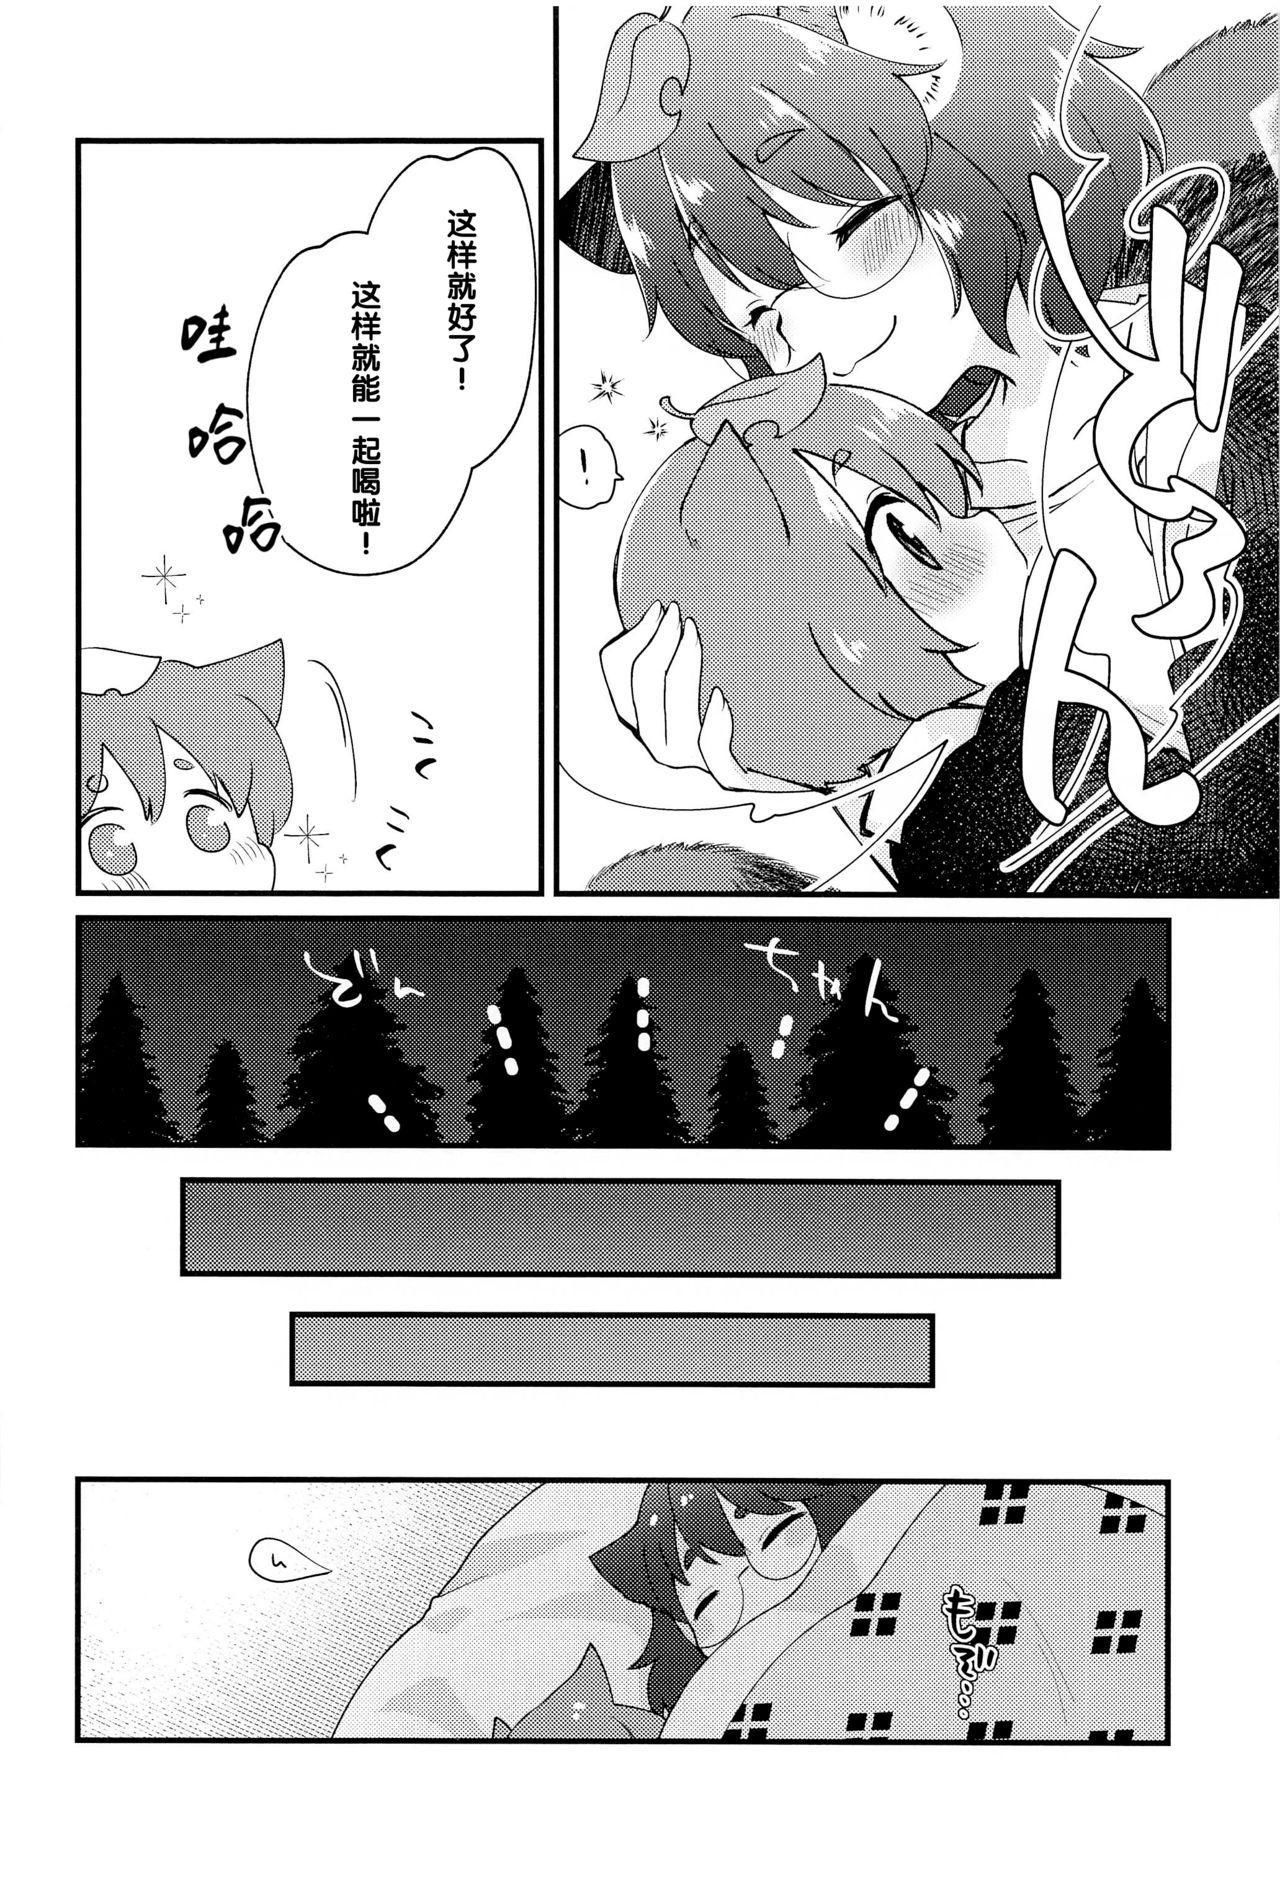 Mamizou-san to Nakayoku Suru Hon 4